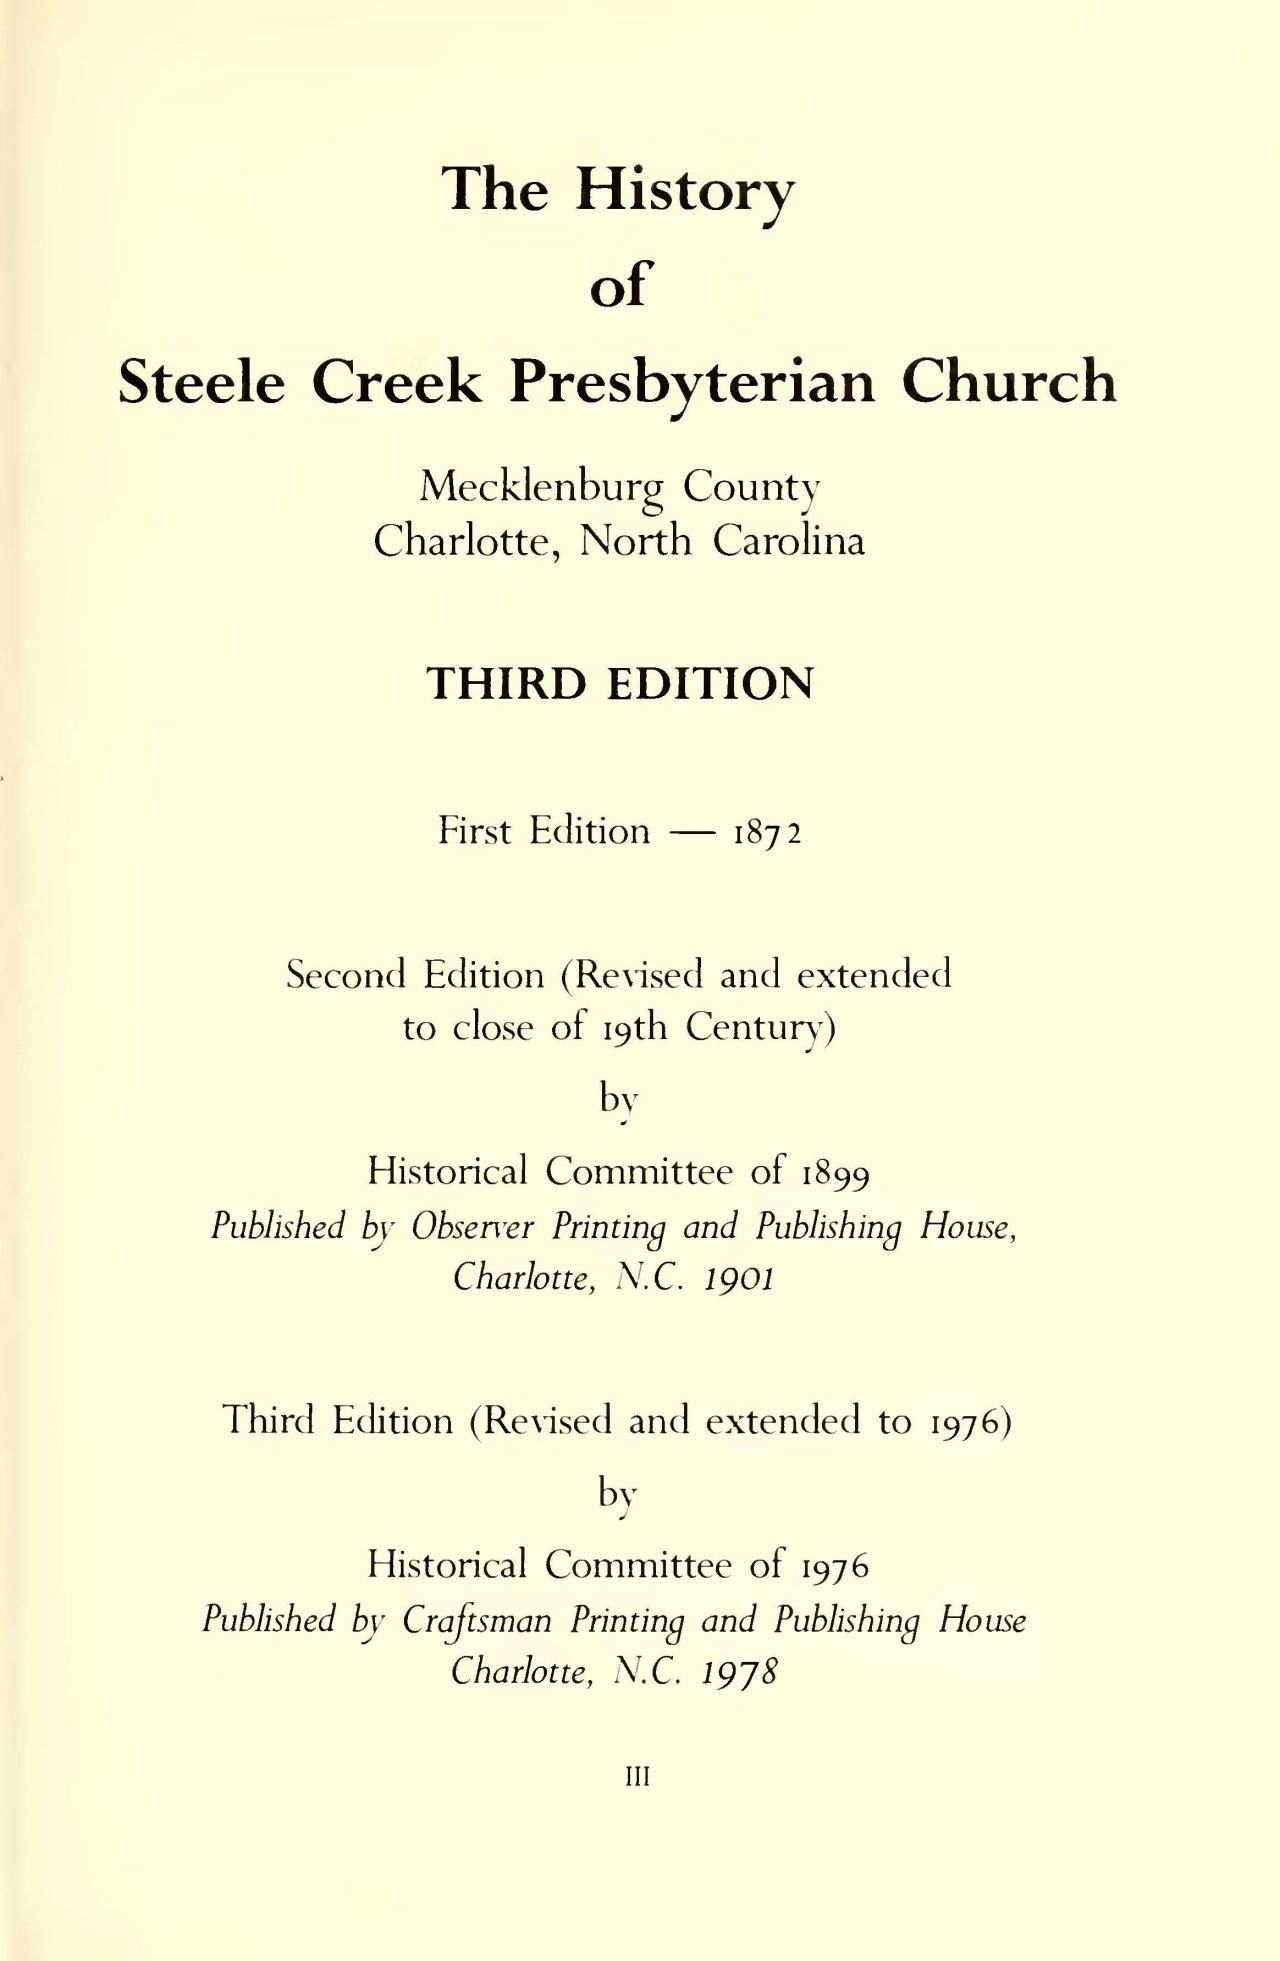 Douglas, John, The History of the Steele Creek Presbyterian Church Title Page.jpg